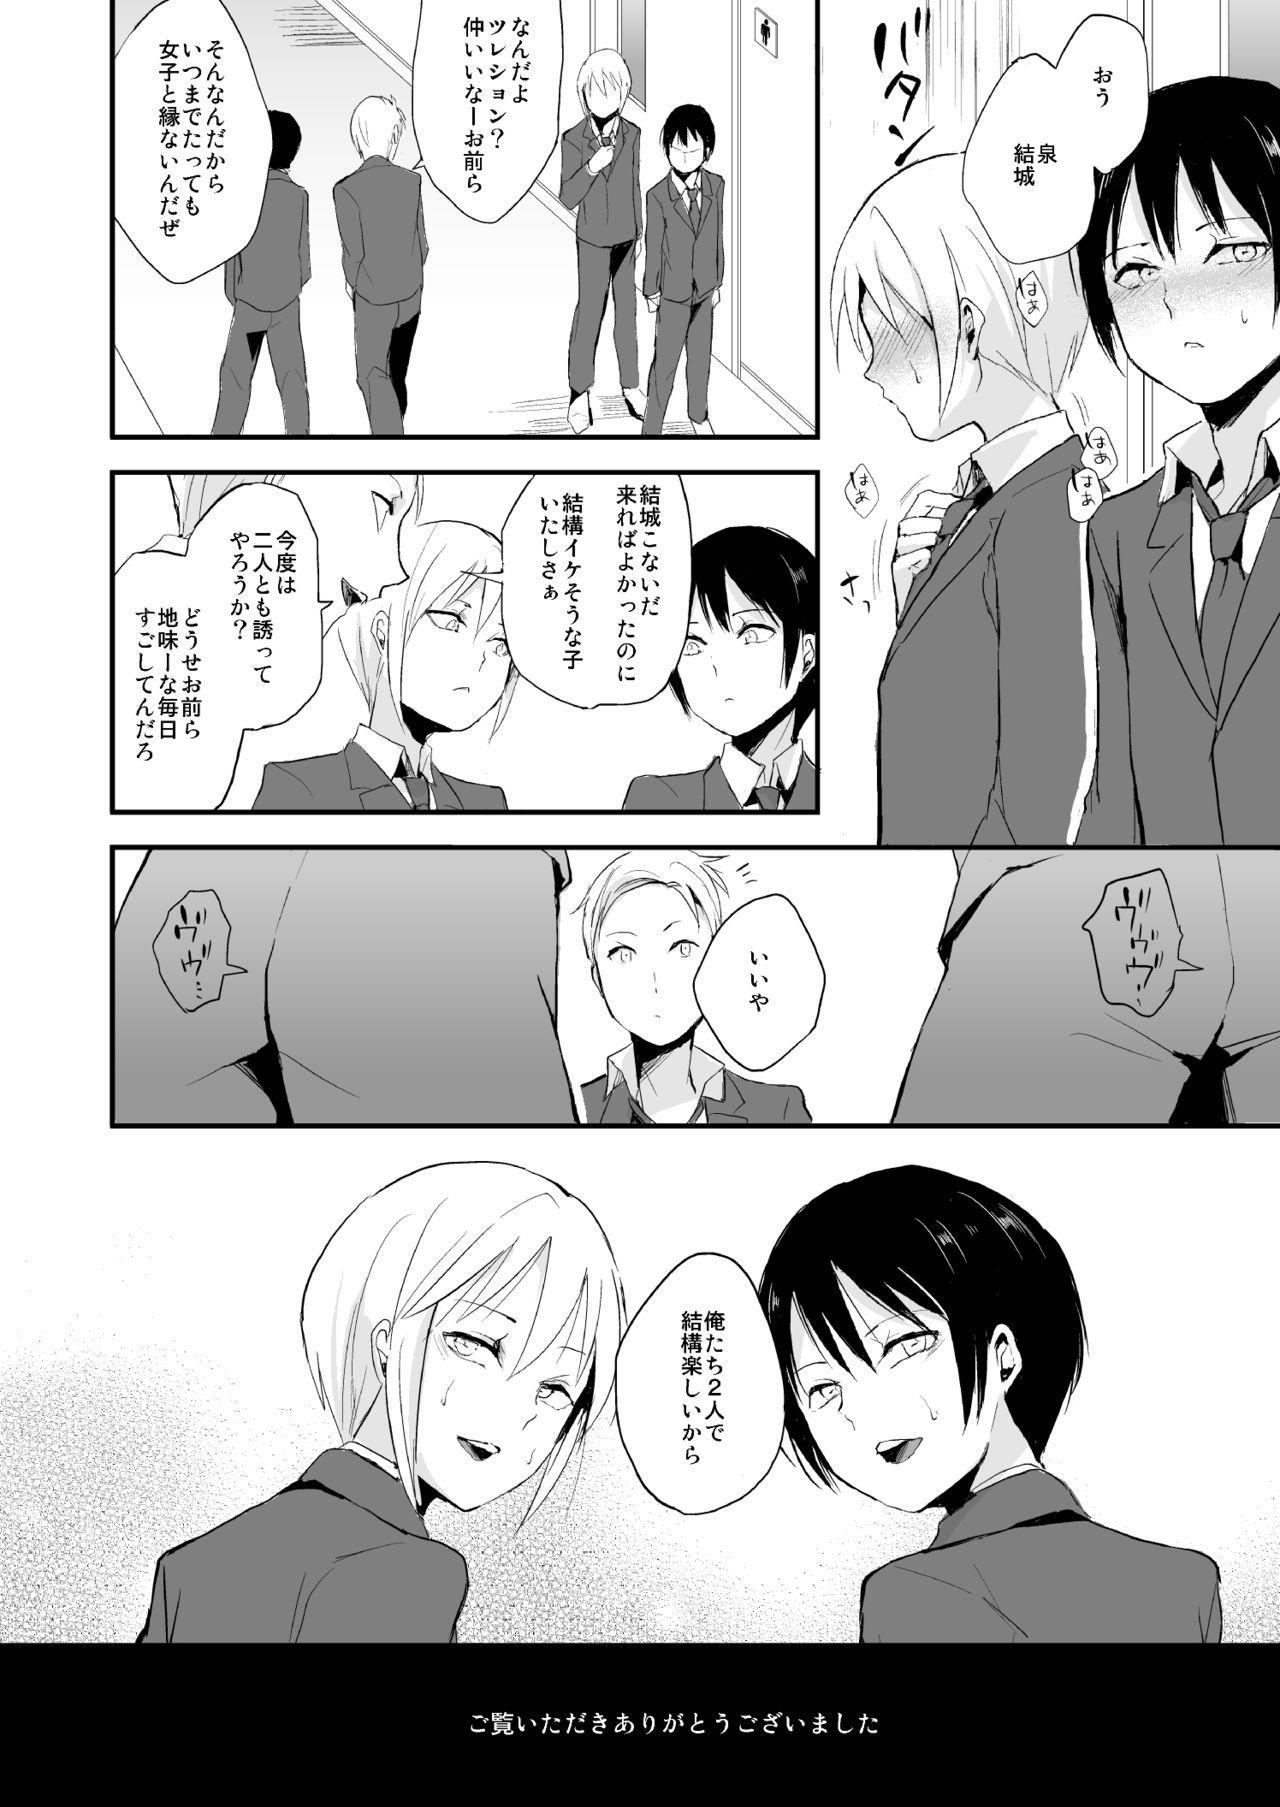 [Yadokugaeru (Locon)] Izumi-kun to Yuuki-kun [Digital] 28